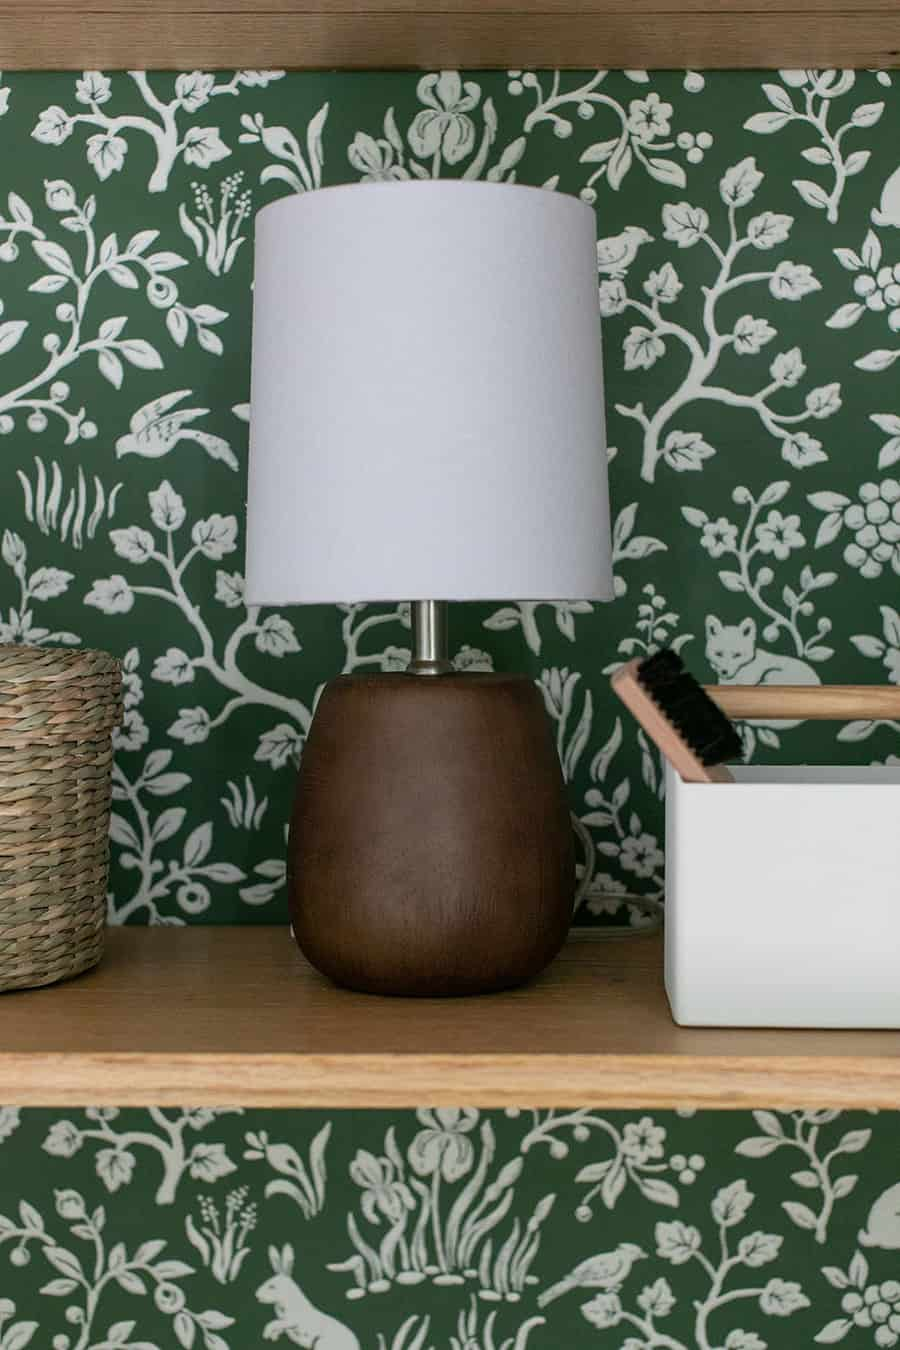 Wooden lamp on an oak shelf with green wallpaper.